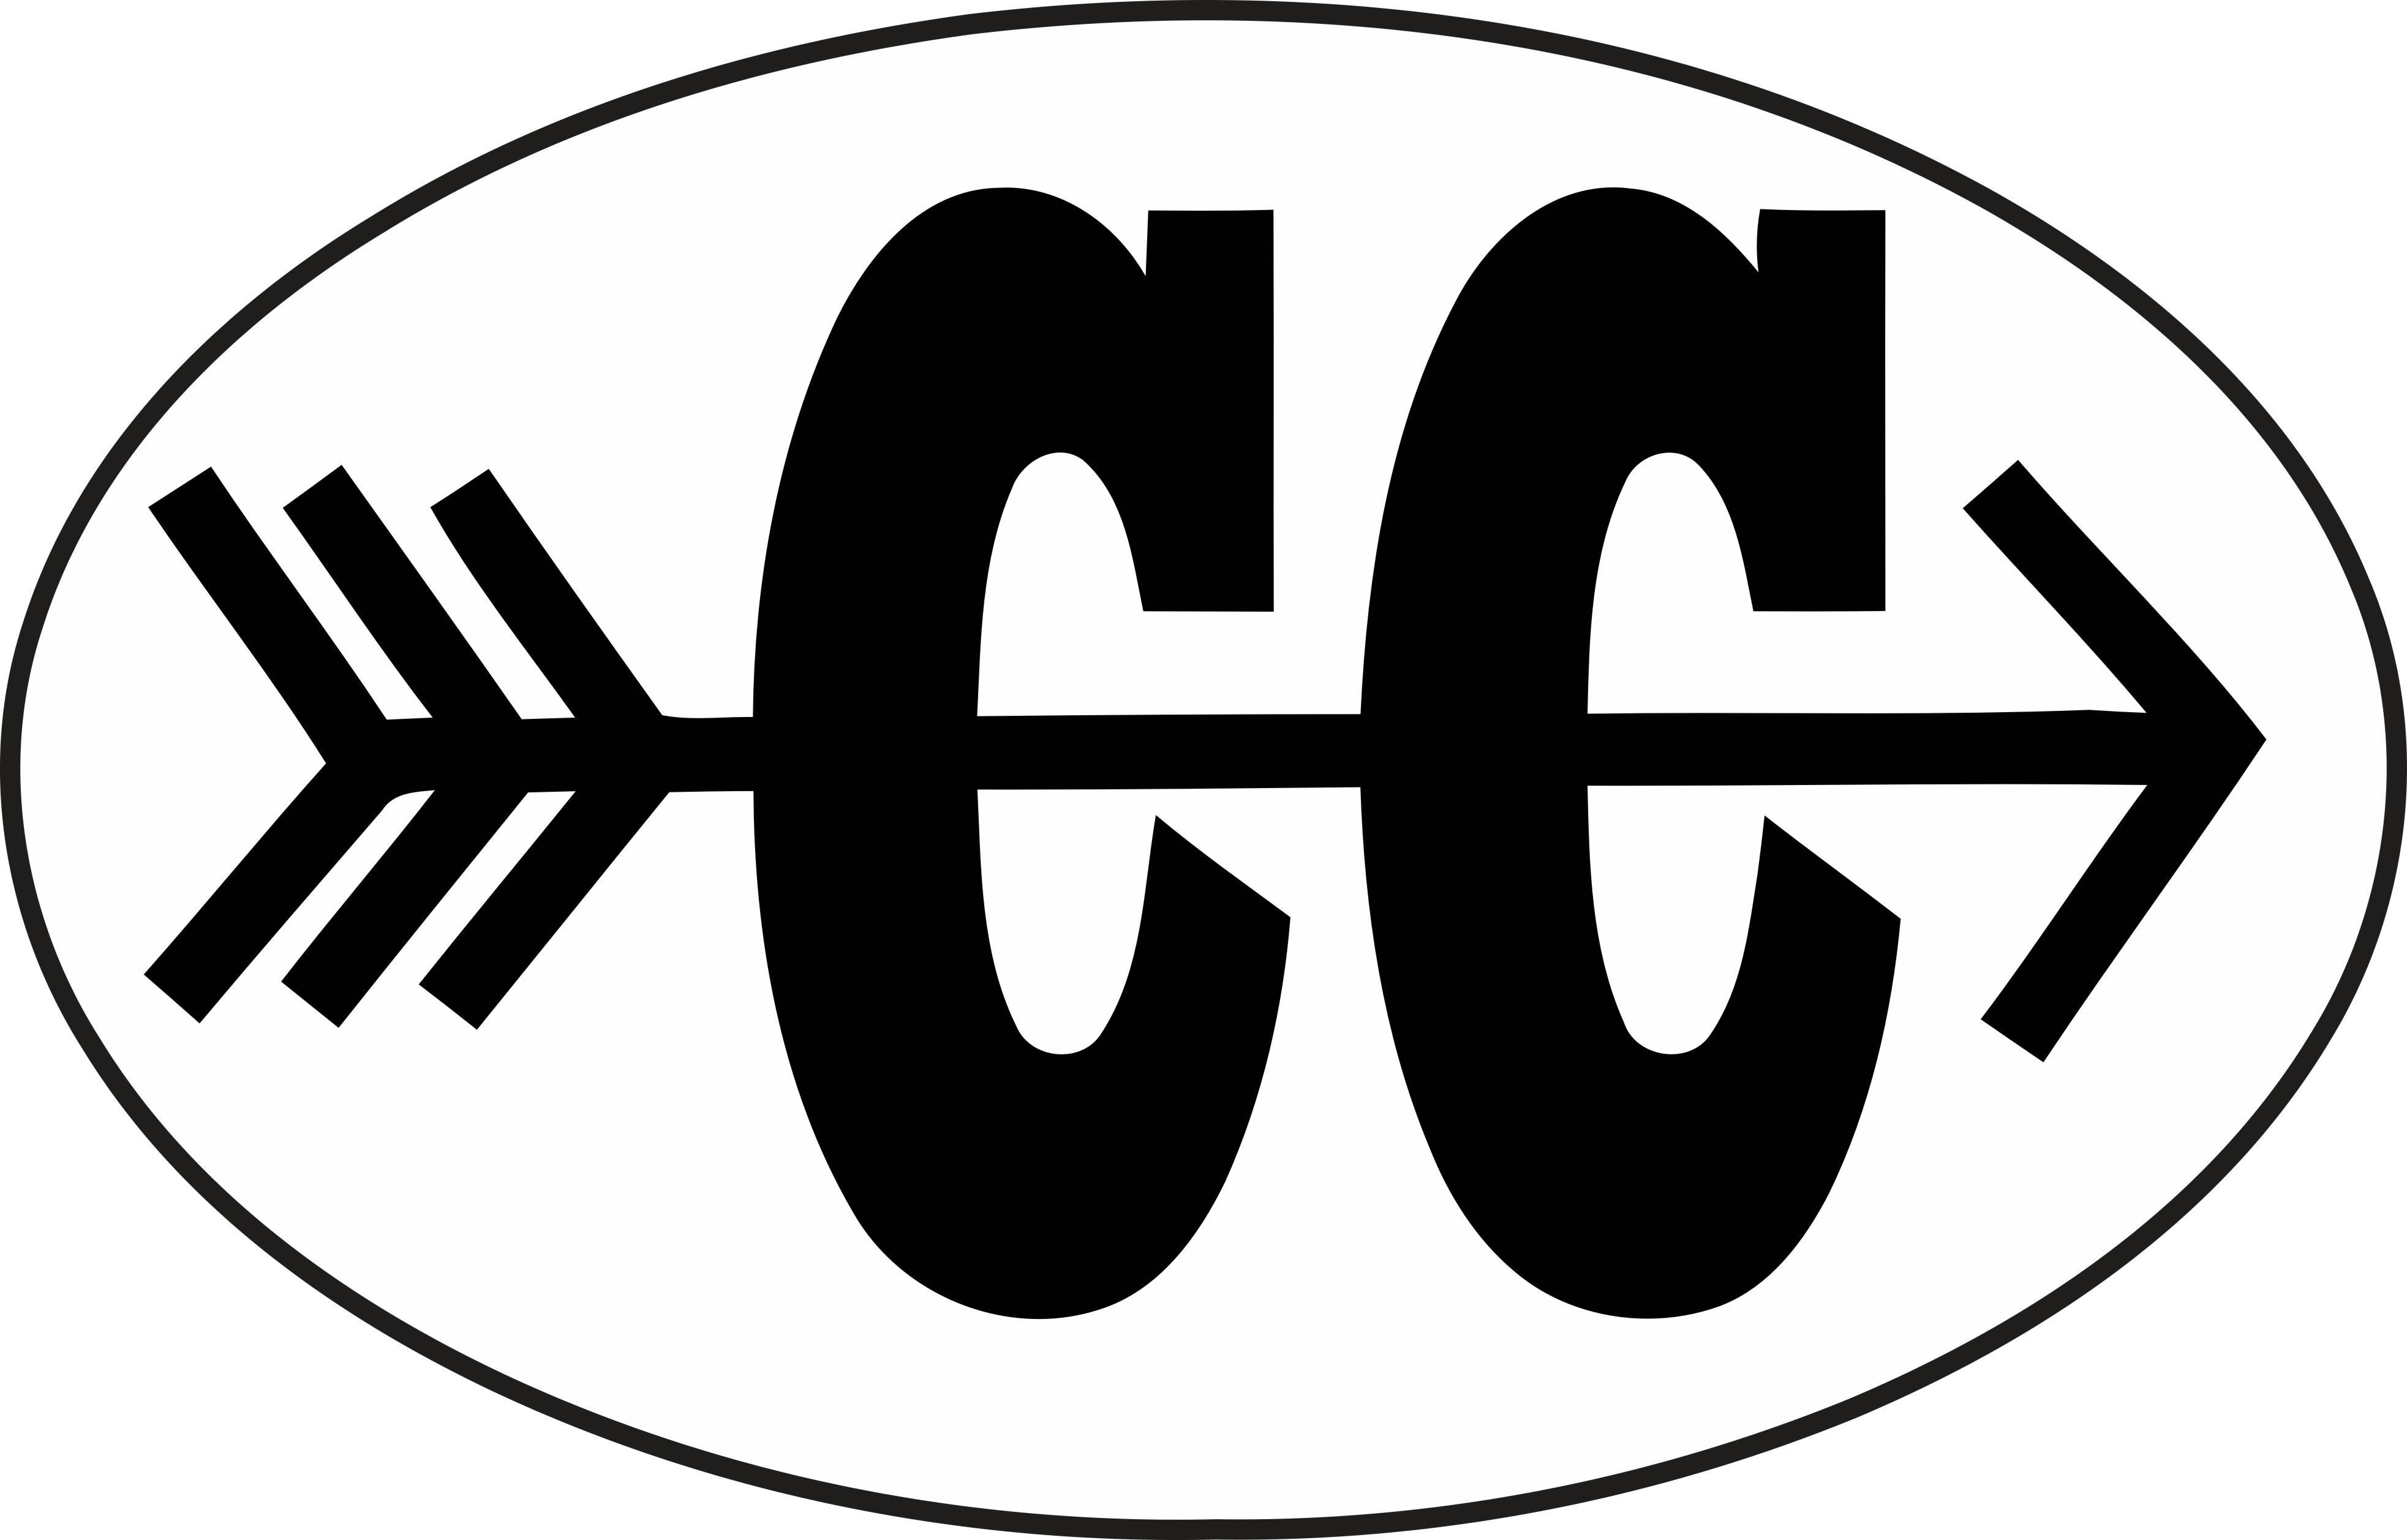 Cross country arrow clipart library Cross country arrow clipart - ClipartFest library